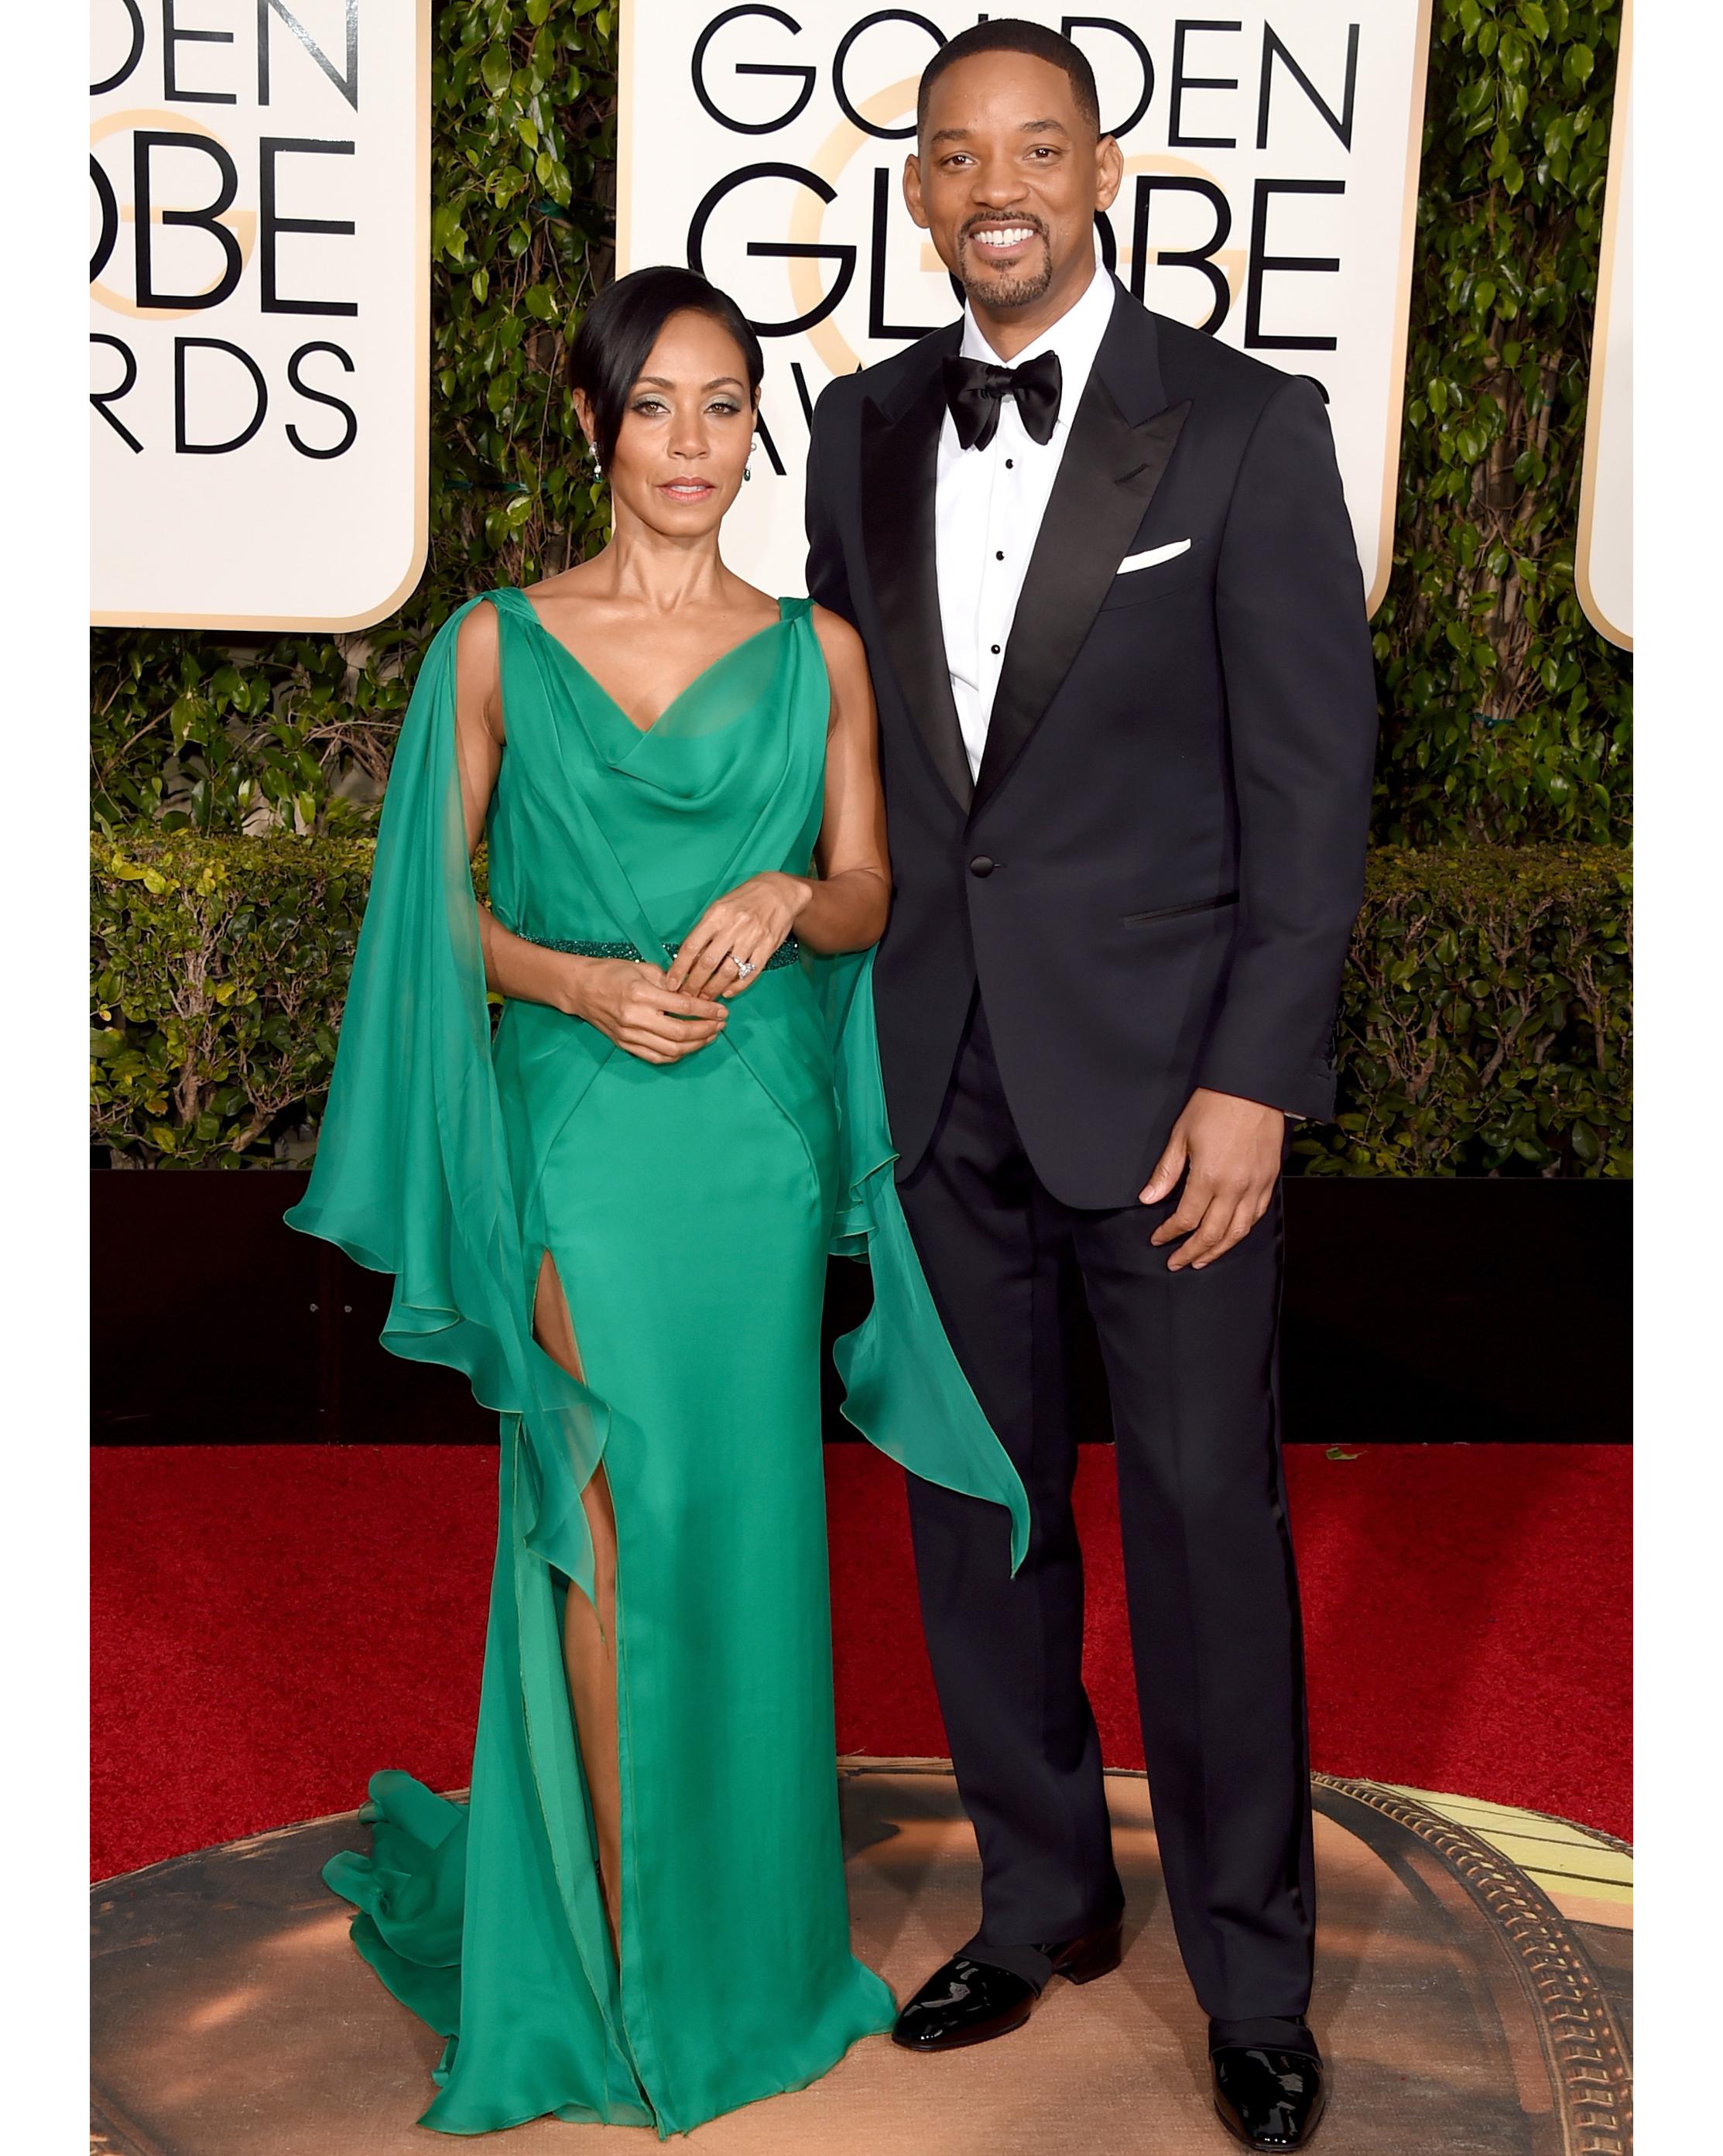 celebrity-couples-will-smith-jada-pinkett-smith-0116.jpg